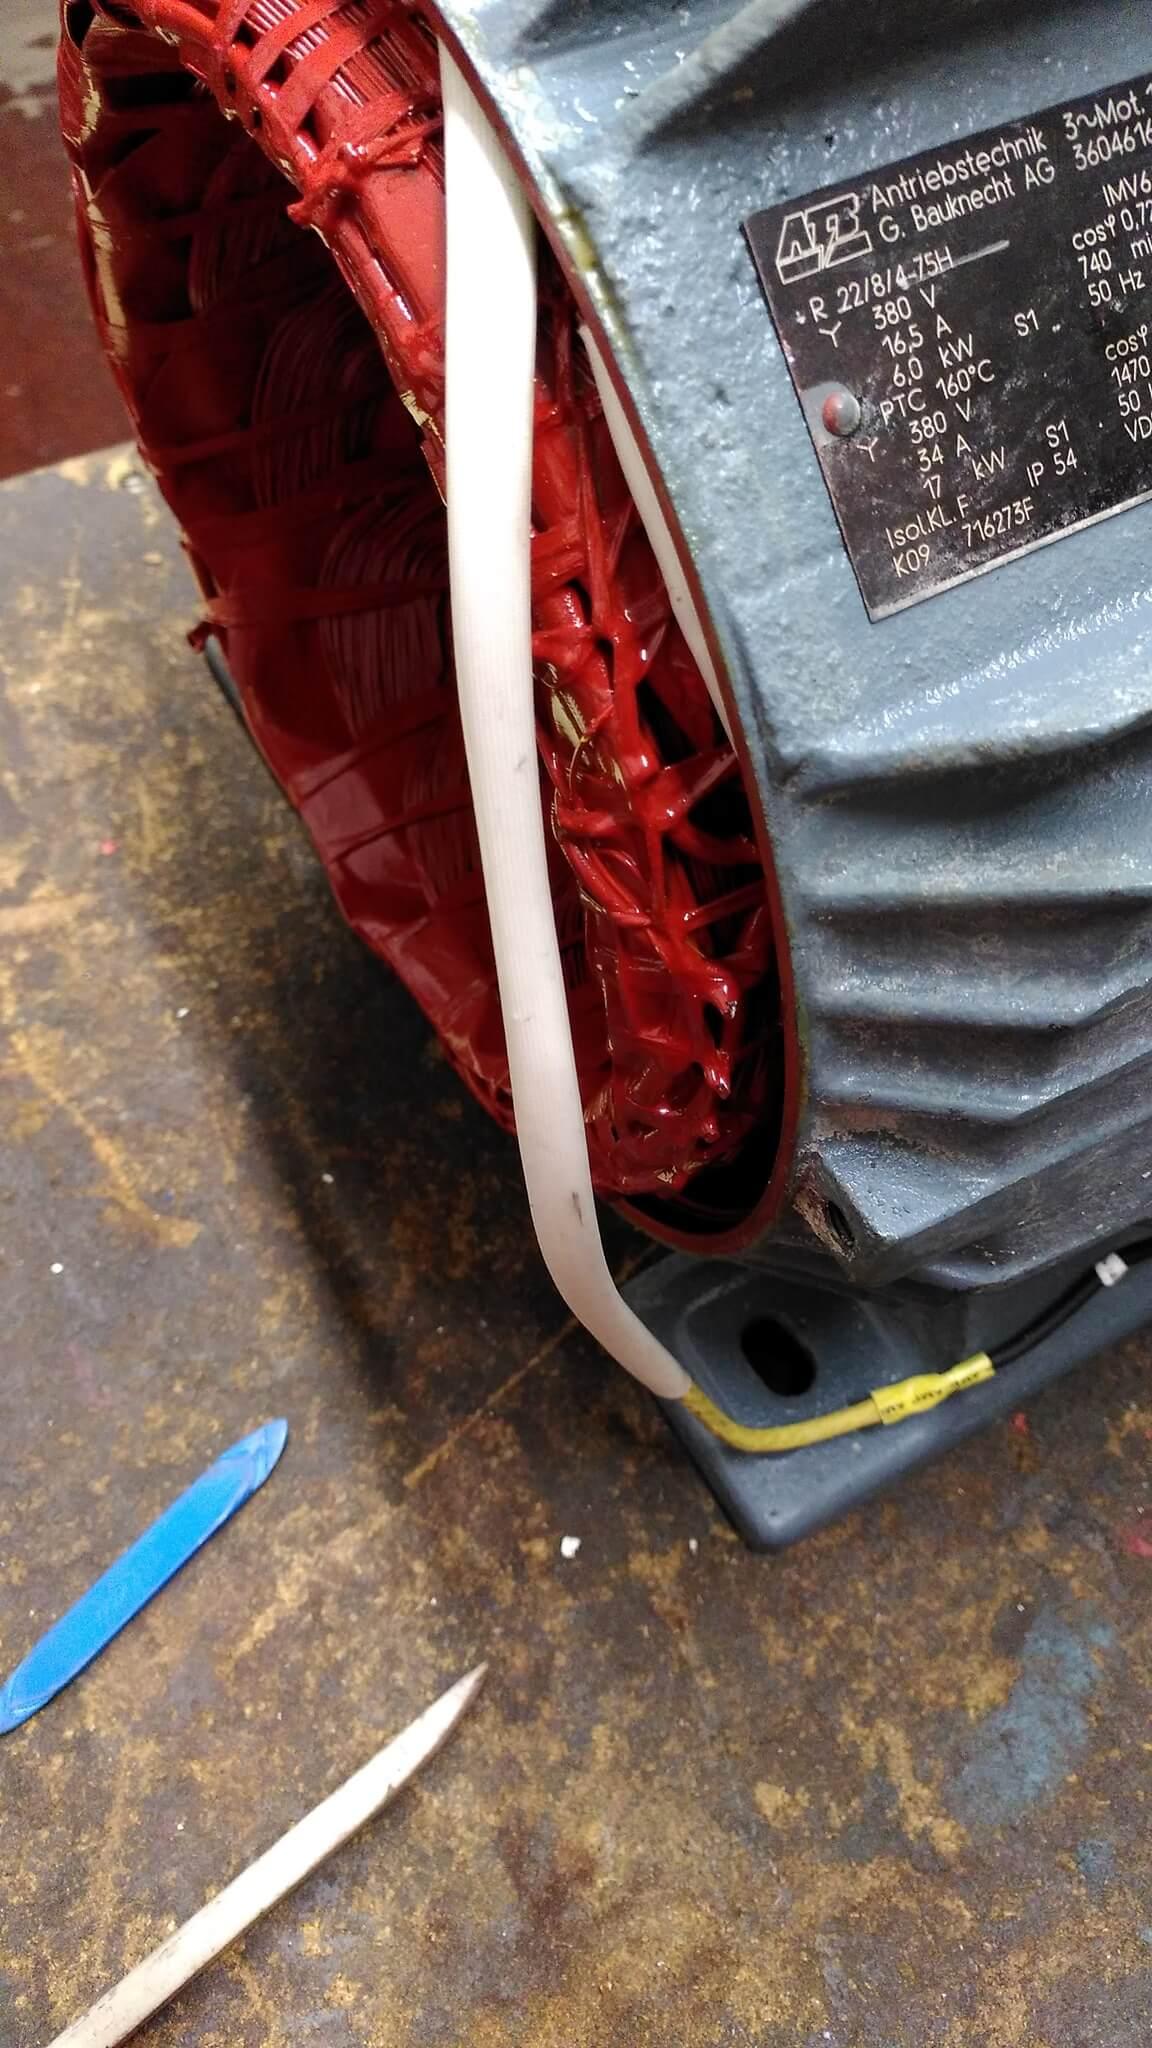 Reparatur eines Drehstrommotors